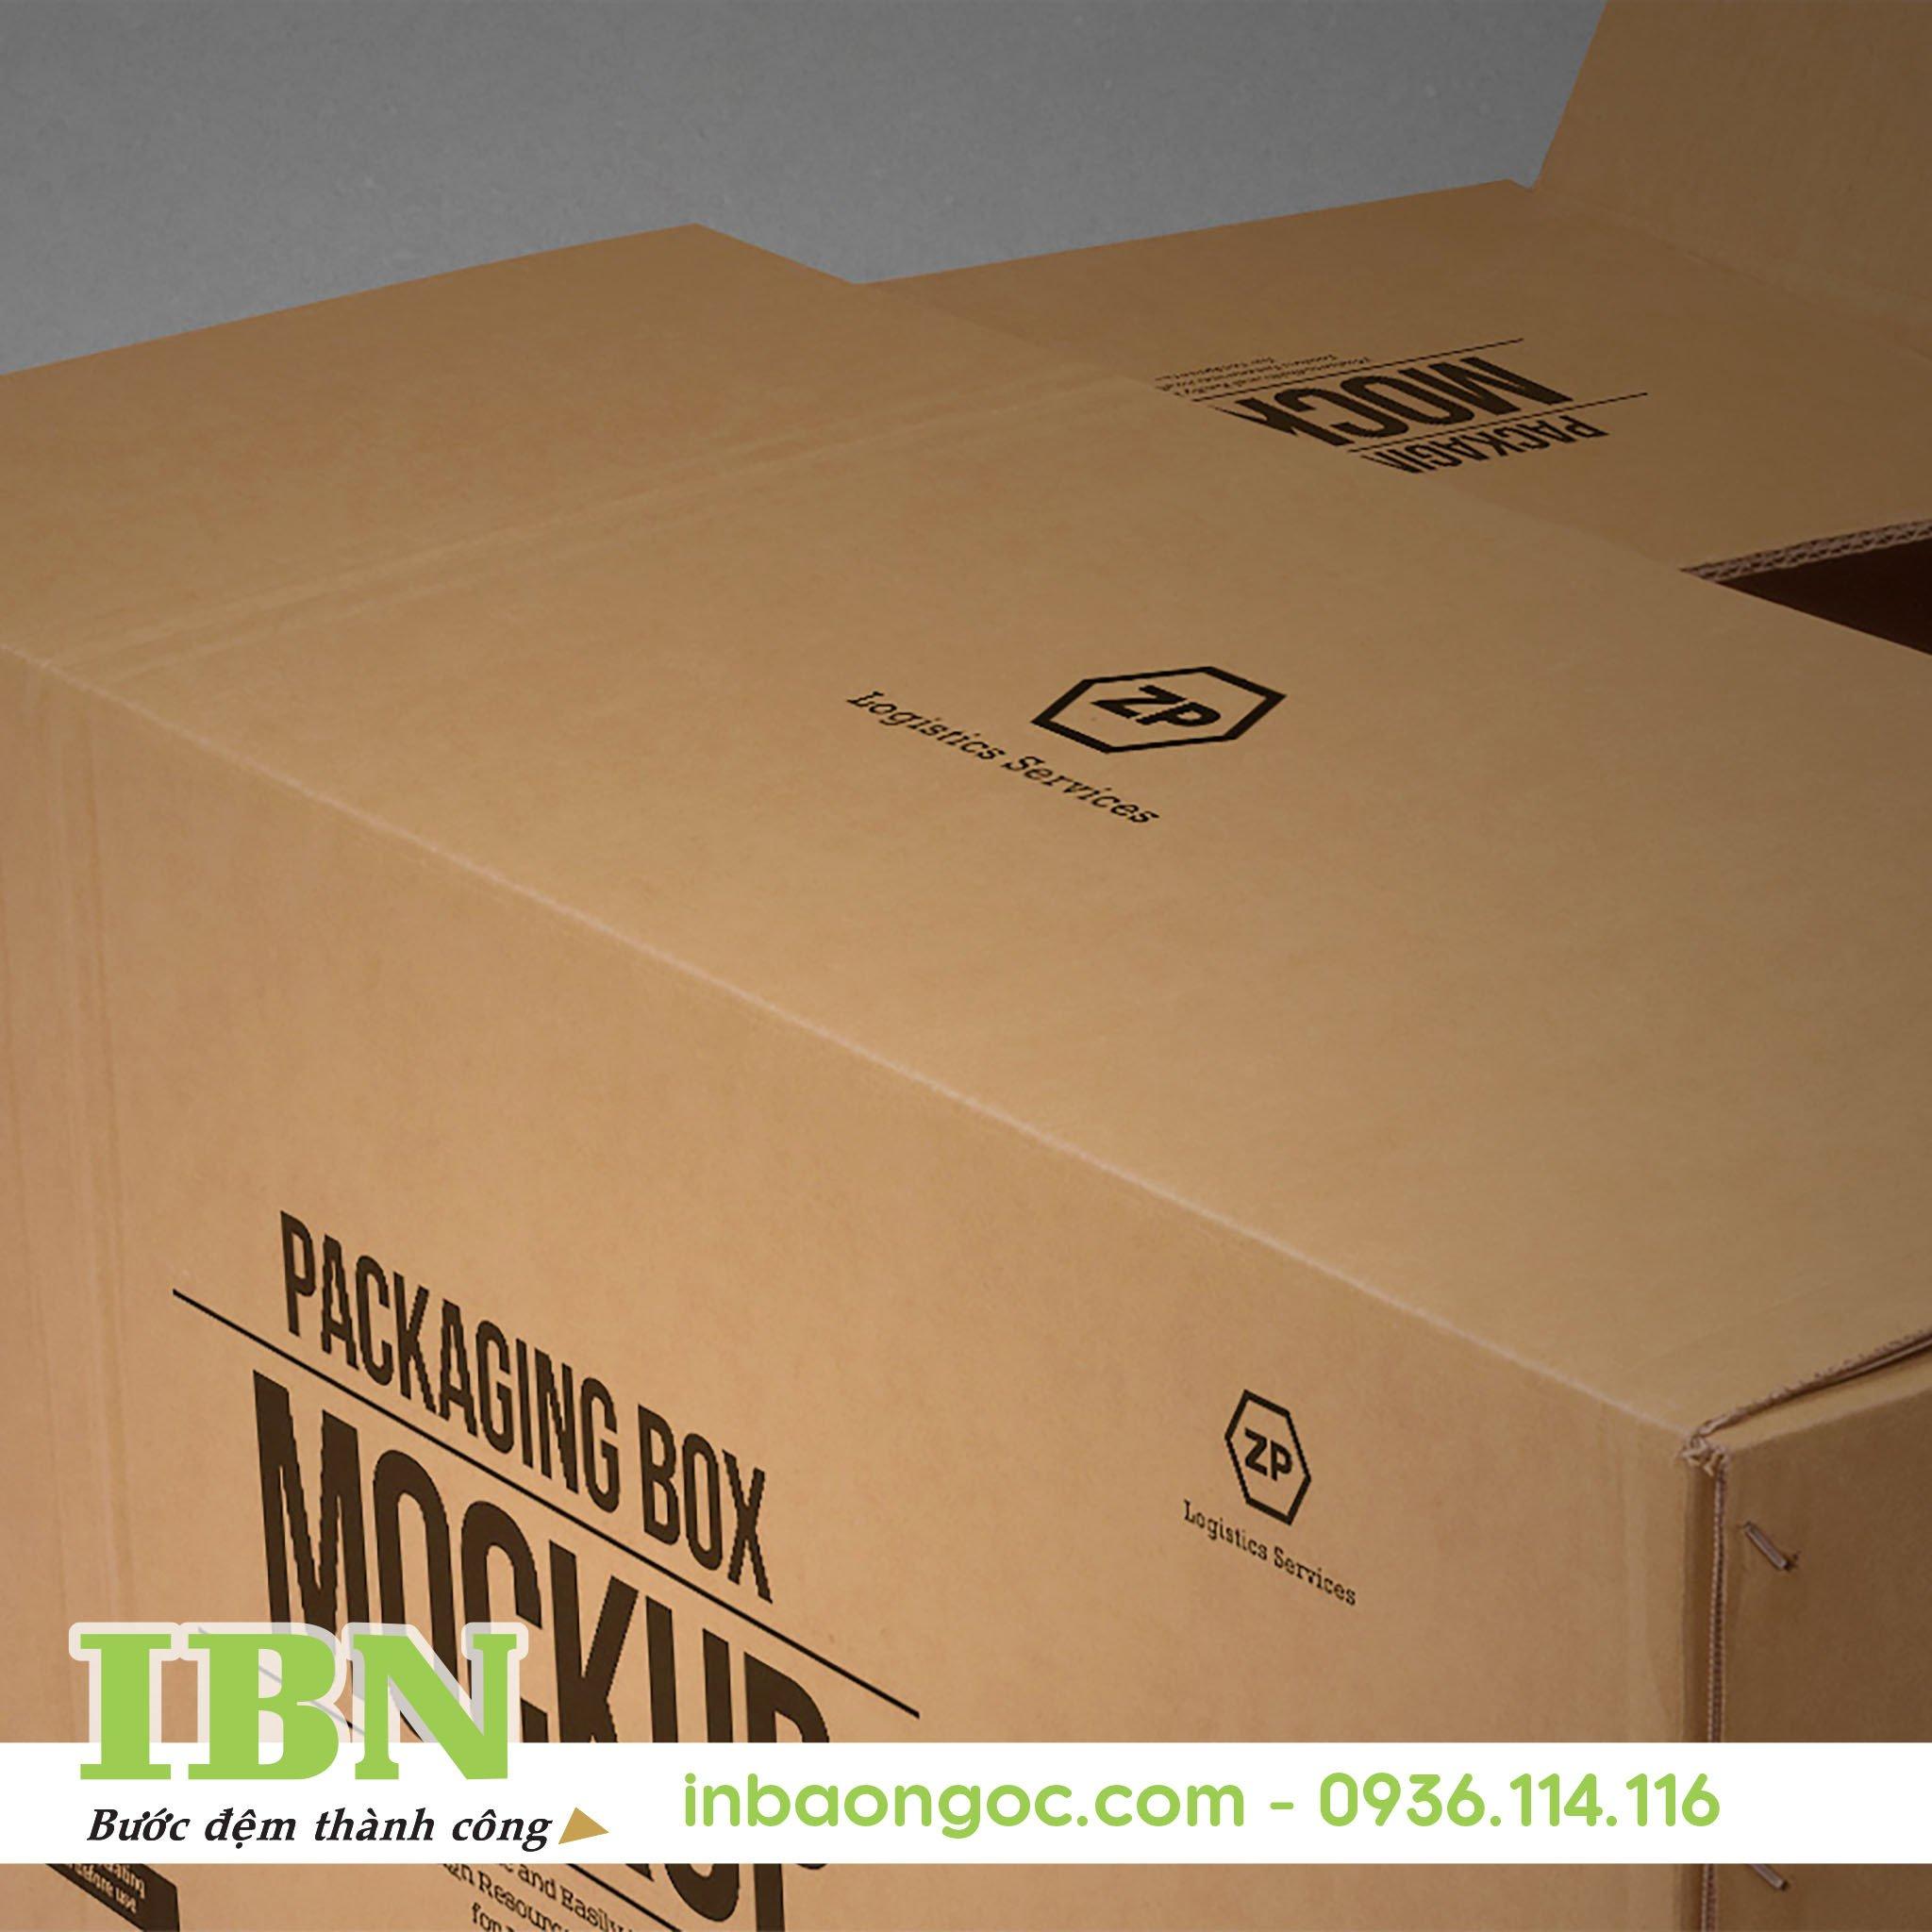 mua thung giay carton o dau tphcm (2)